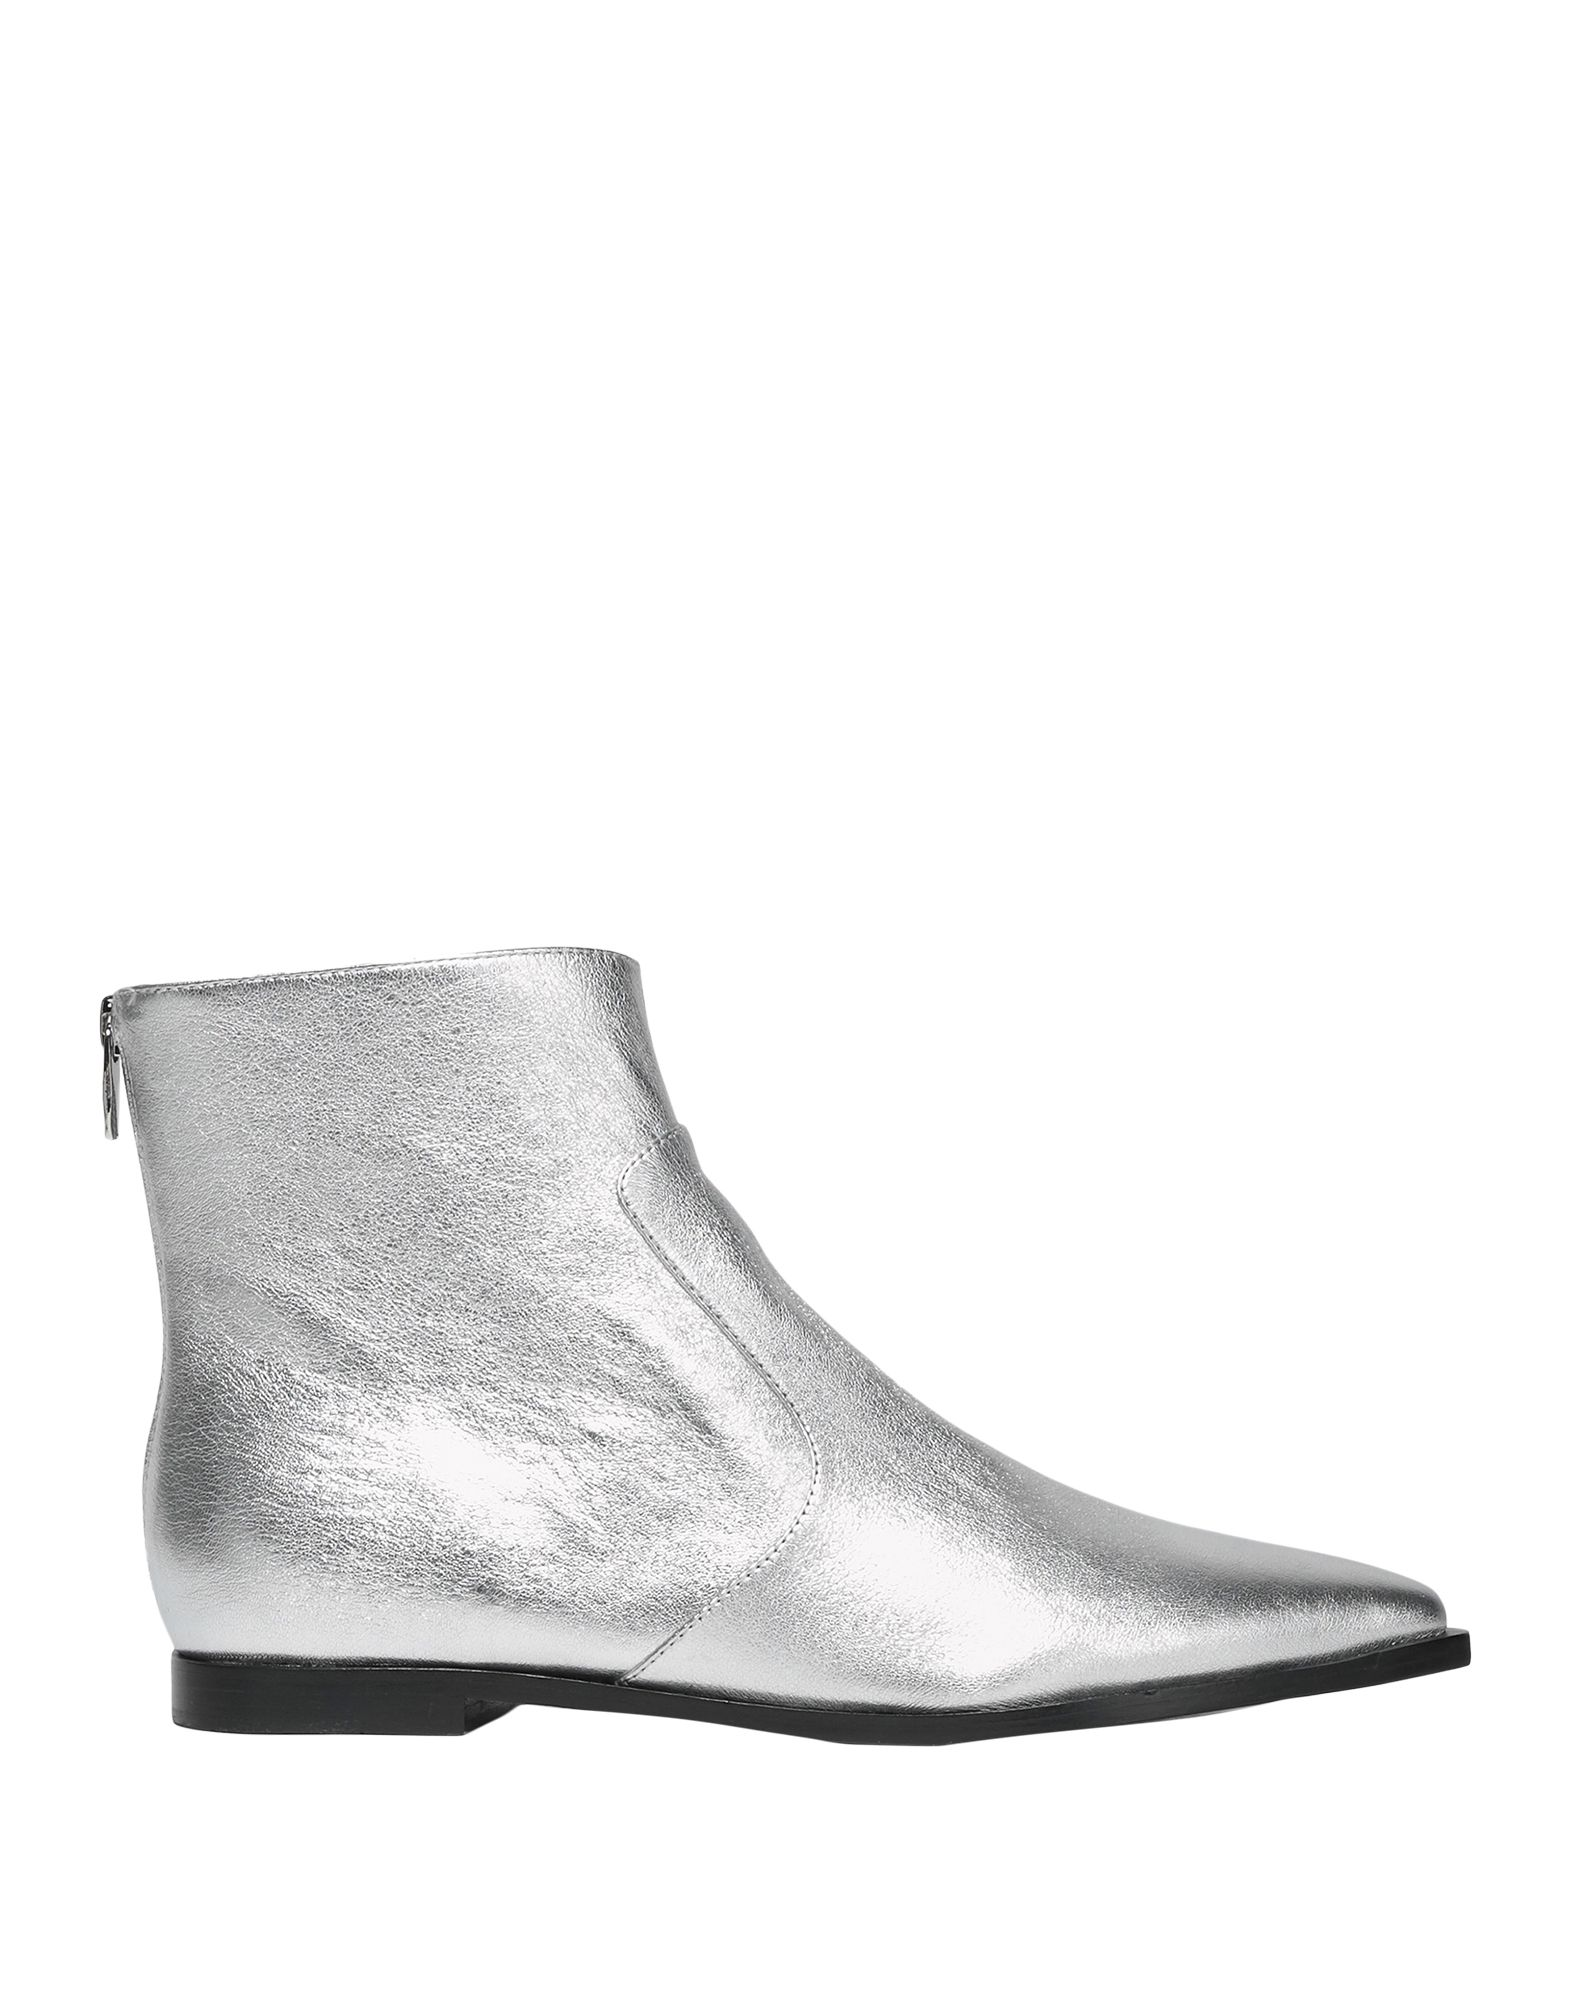 SIGERSON MORRISON Полусапоги и высокие ботинки полусапоги belle by sigerson morrison ботинки без каблука